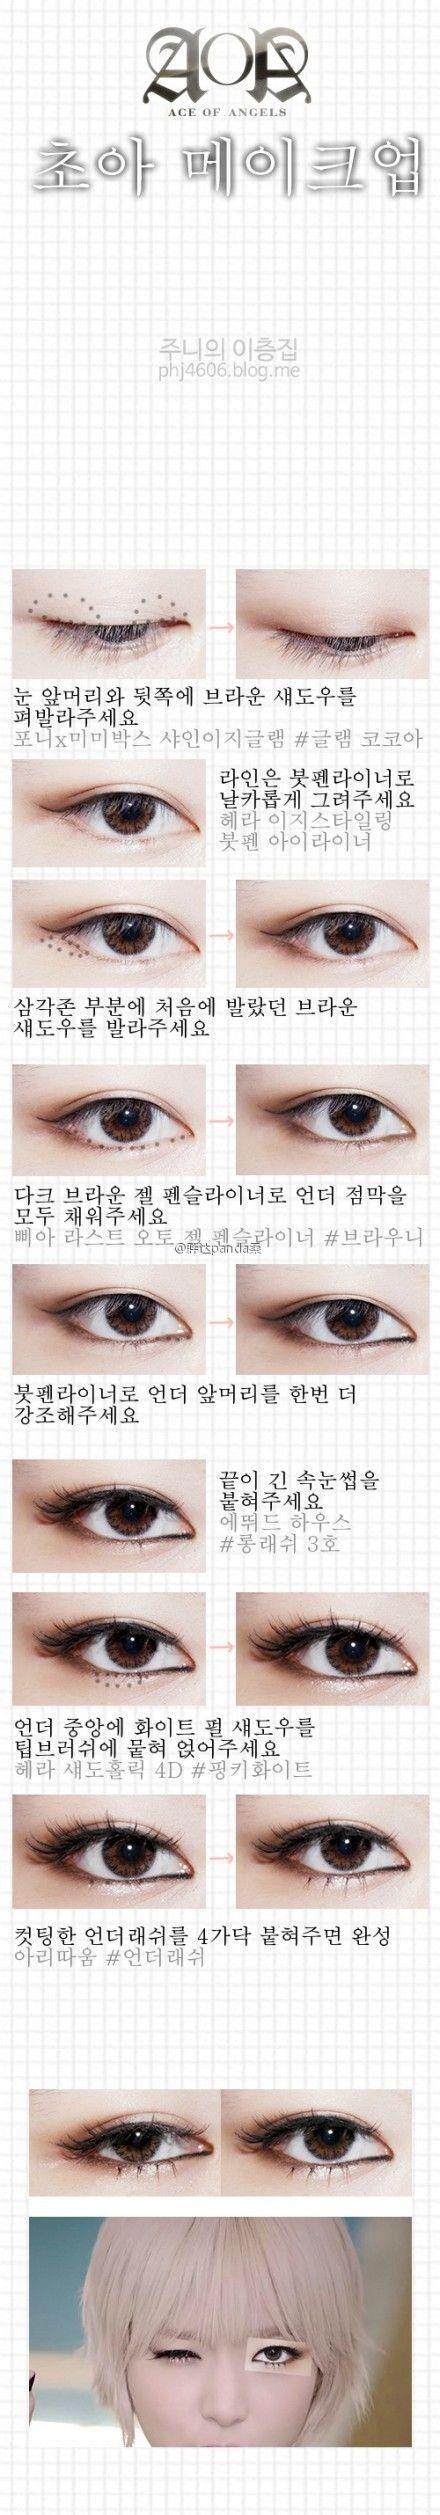 Korean make up AOA    http://nerium.kr/preenroll/debbiekrug?alias=debbiekrug